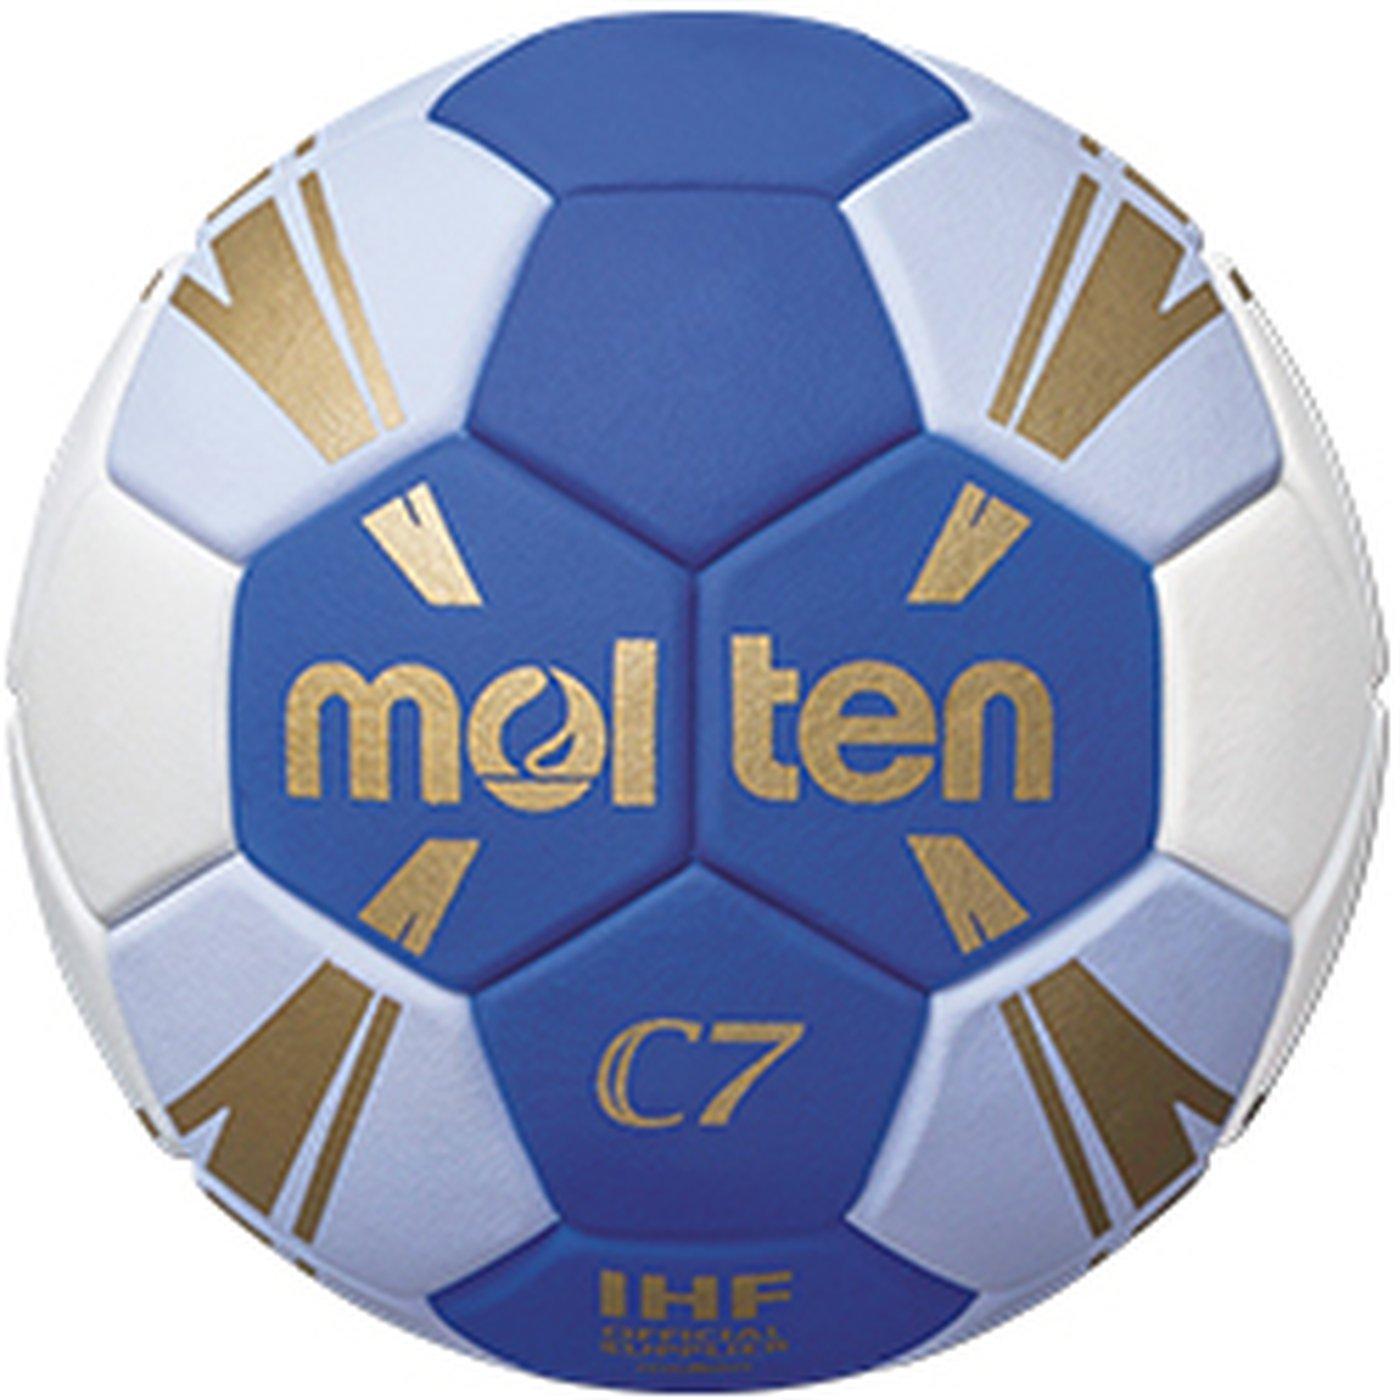 Molten h0C3500de BW de balonmano C7tamaño 0Azul de color blanco niños azul/blanco/oro, tamaño 0